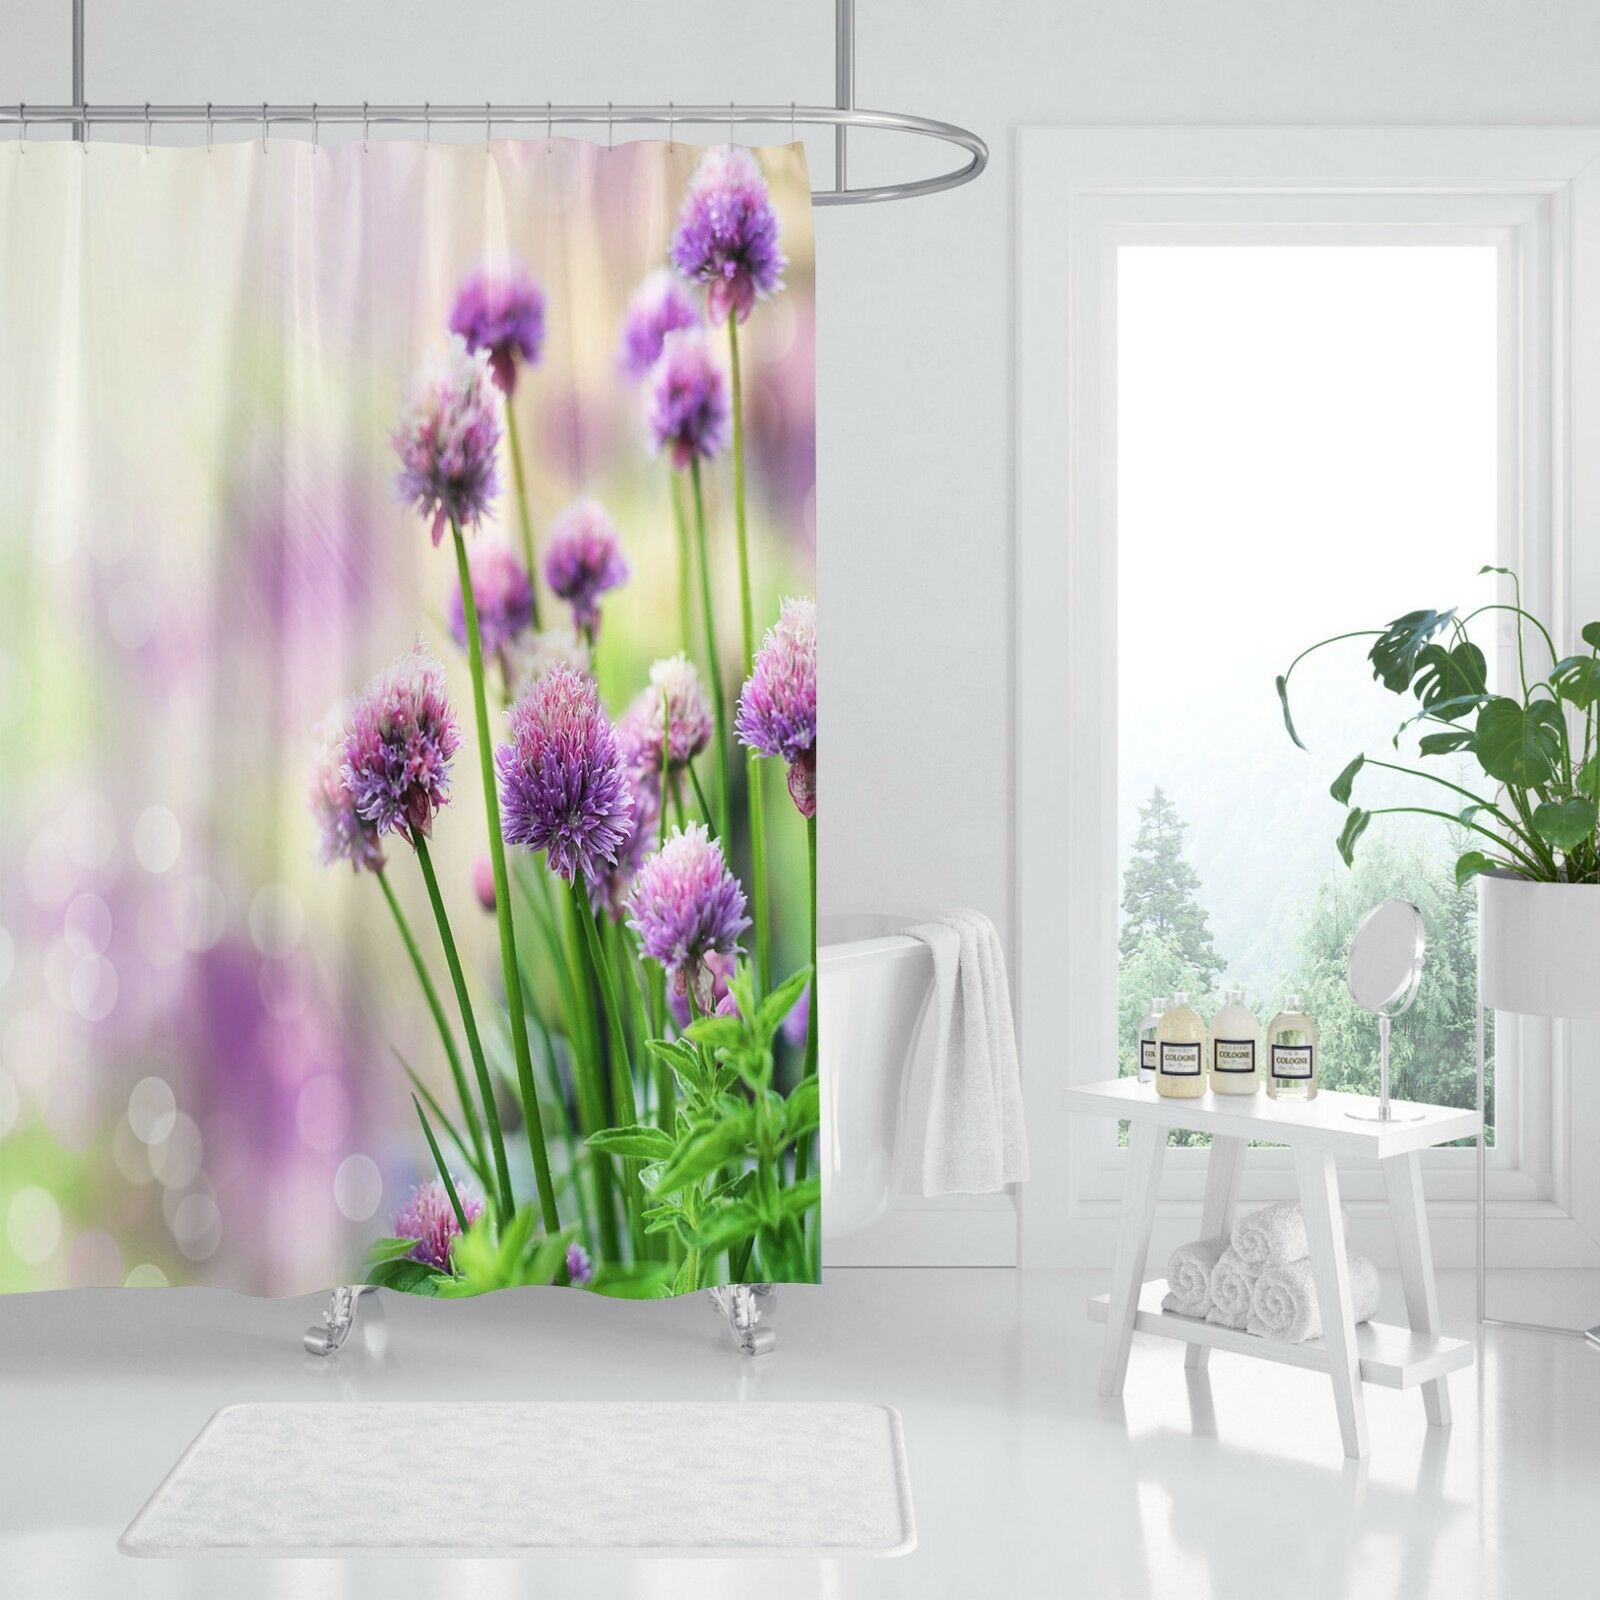 3D Lila Blaumen 7 Duschvorhang Wasserdicht Faser Bad Daheim Windows Windows Windows Toilette DE | Perfekt In Verarbeitung  9c8c91